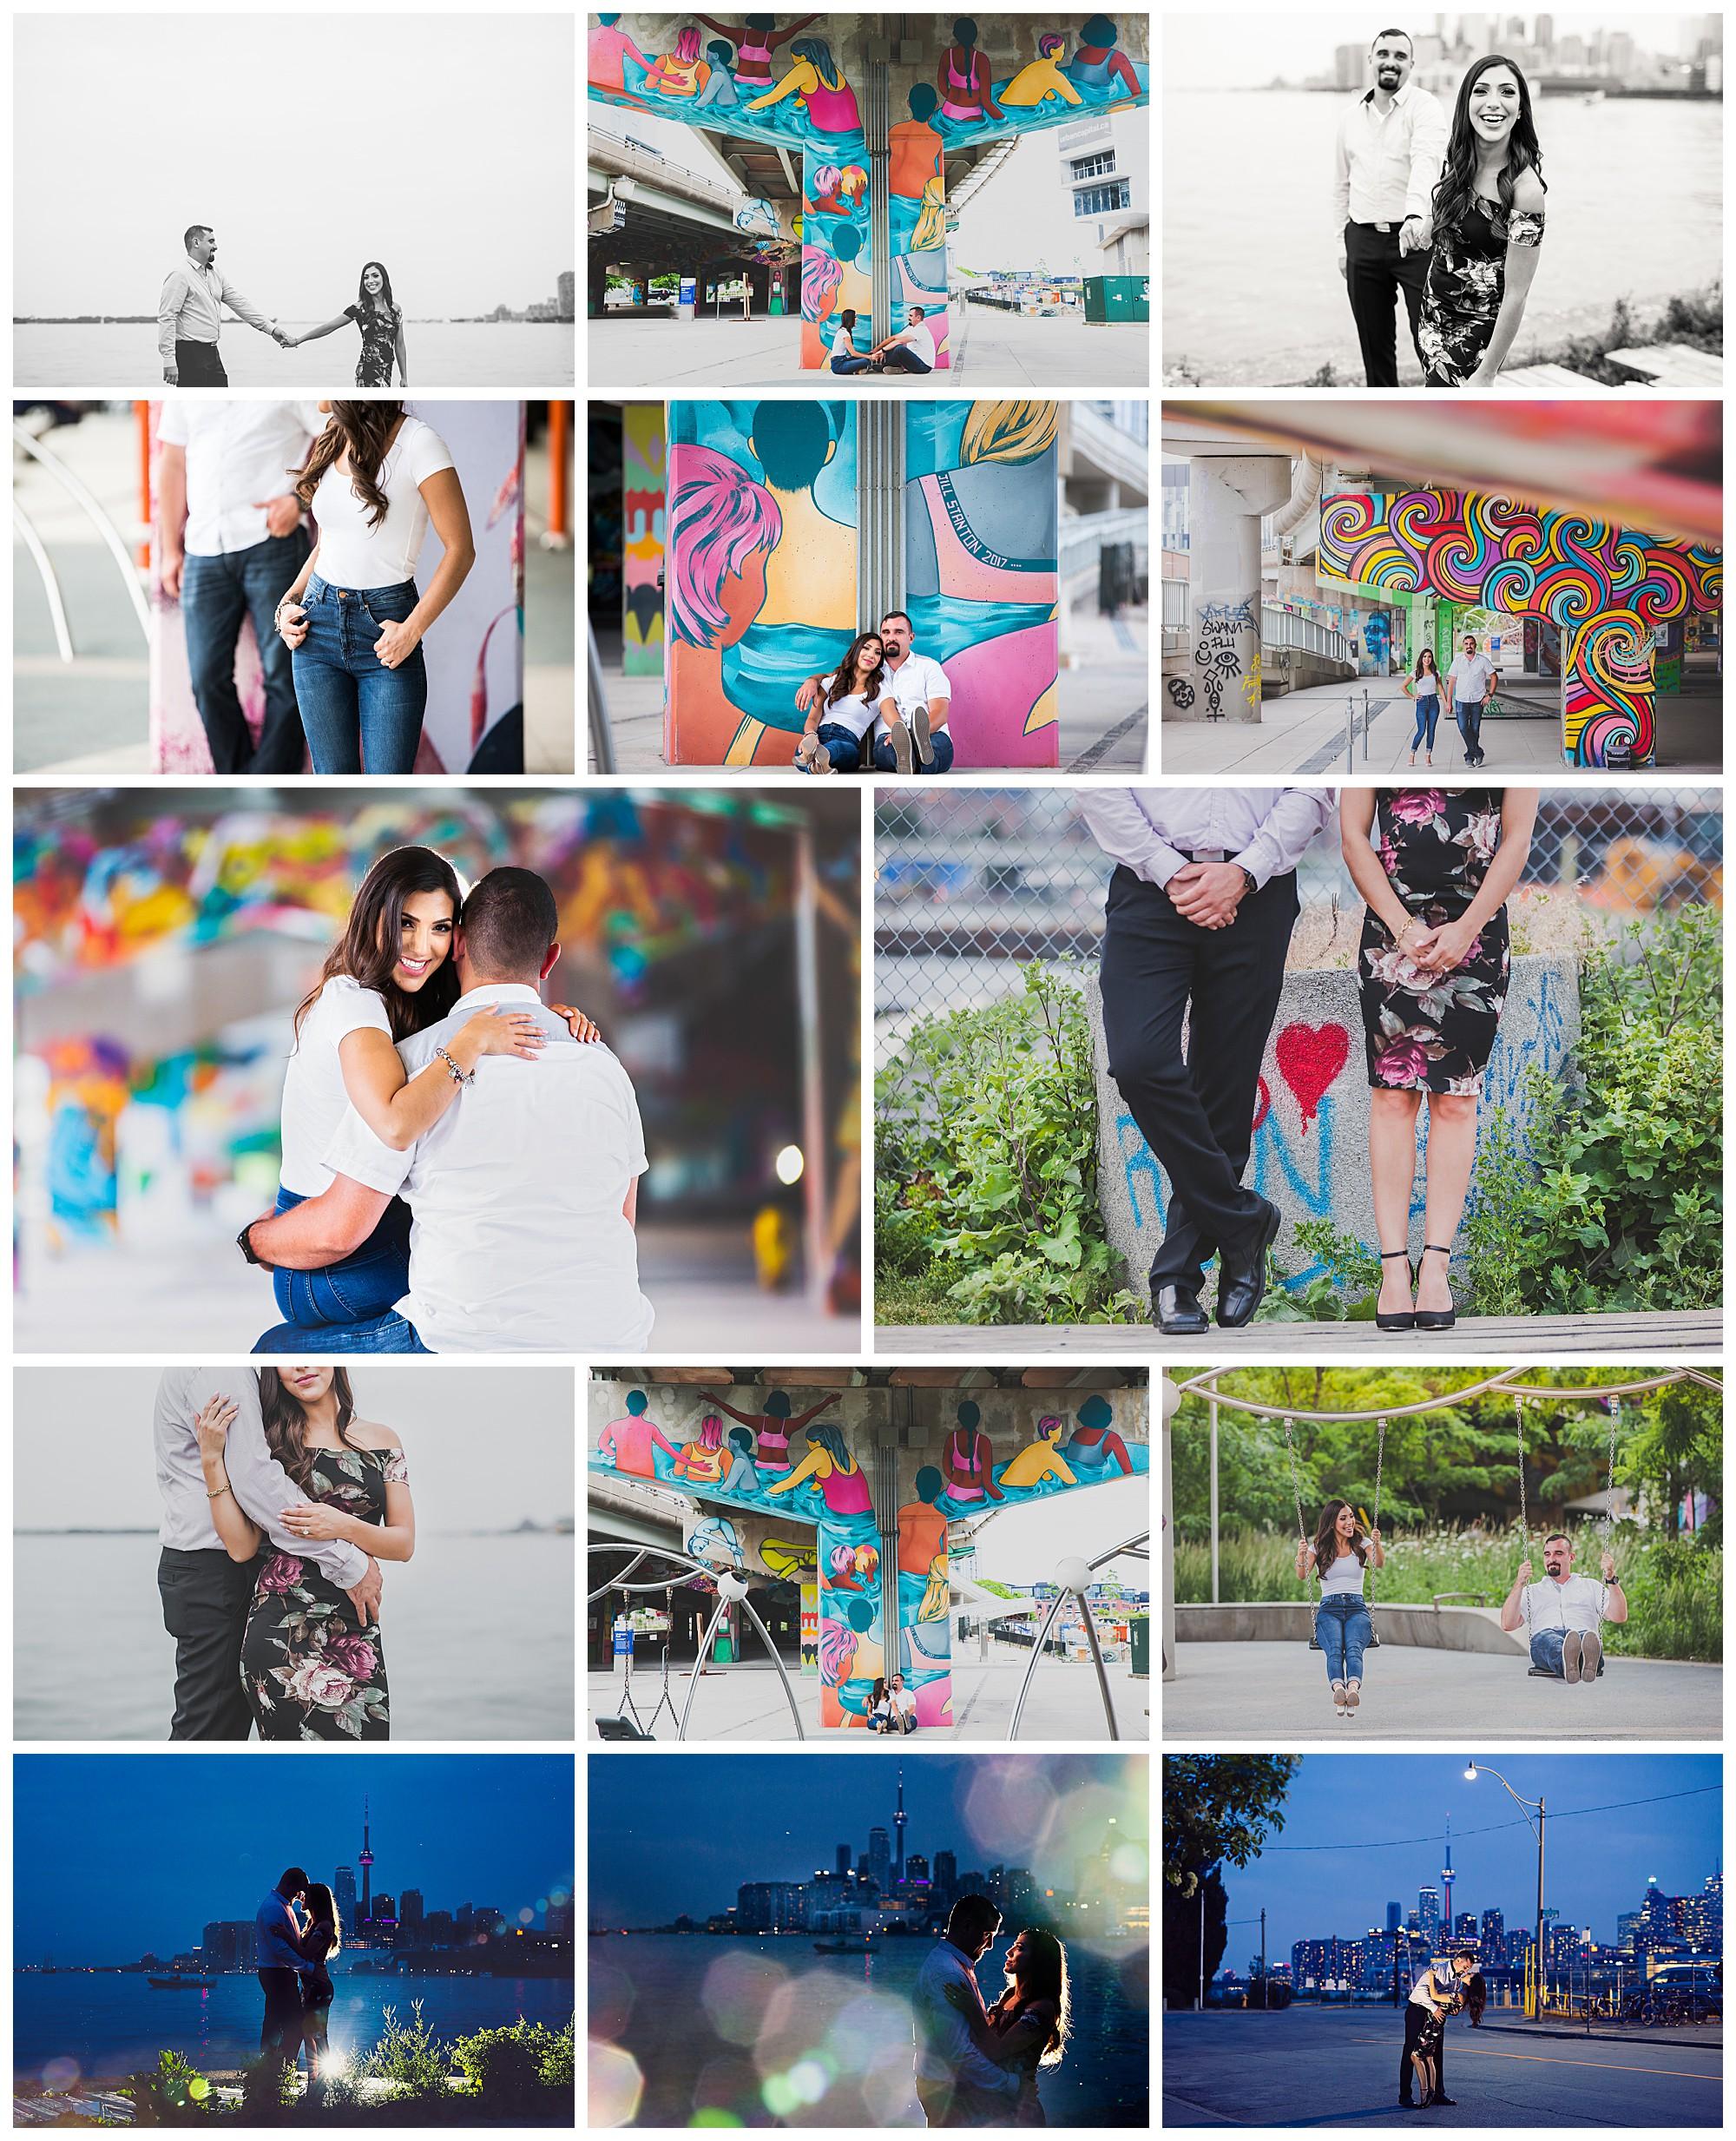 Toronto Lakefront, Toronto Ontario skyline and grafitti engagement photos by VanDaele & Russell